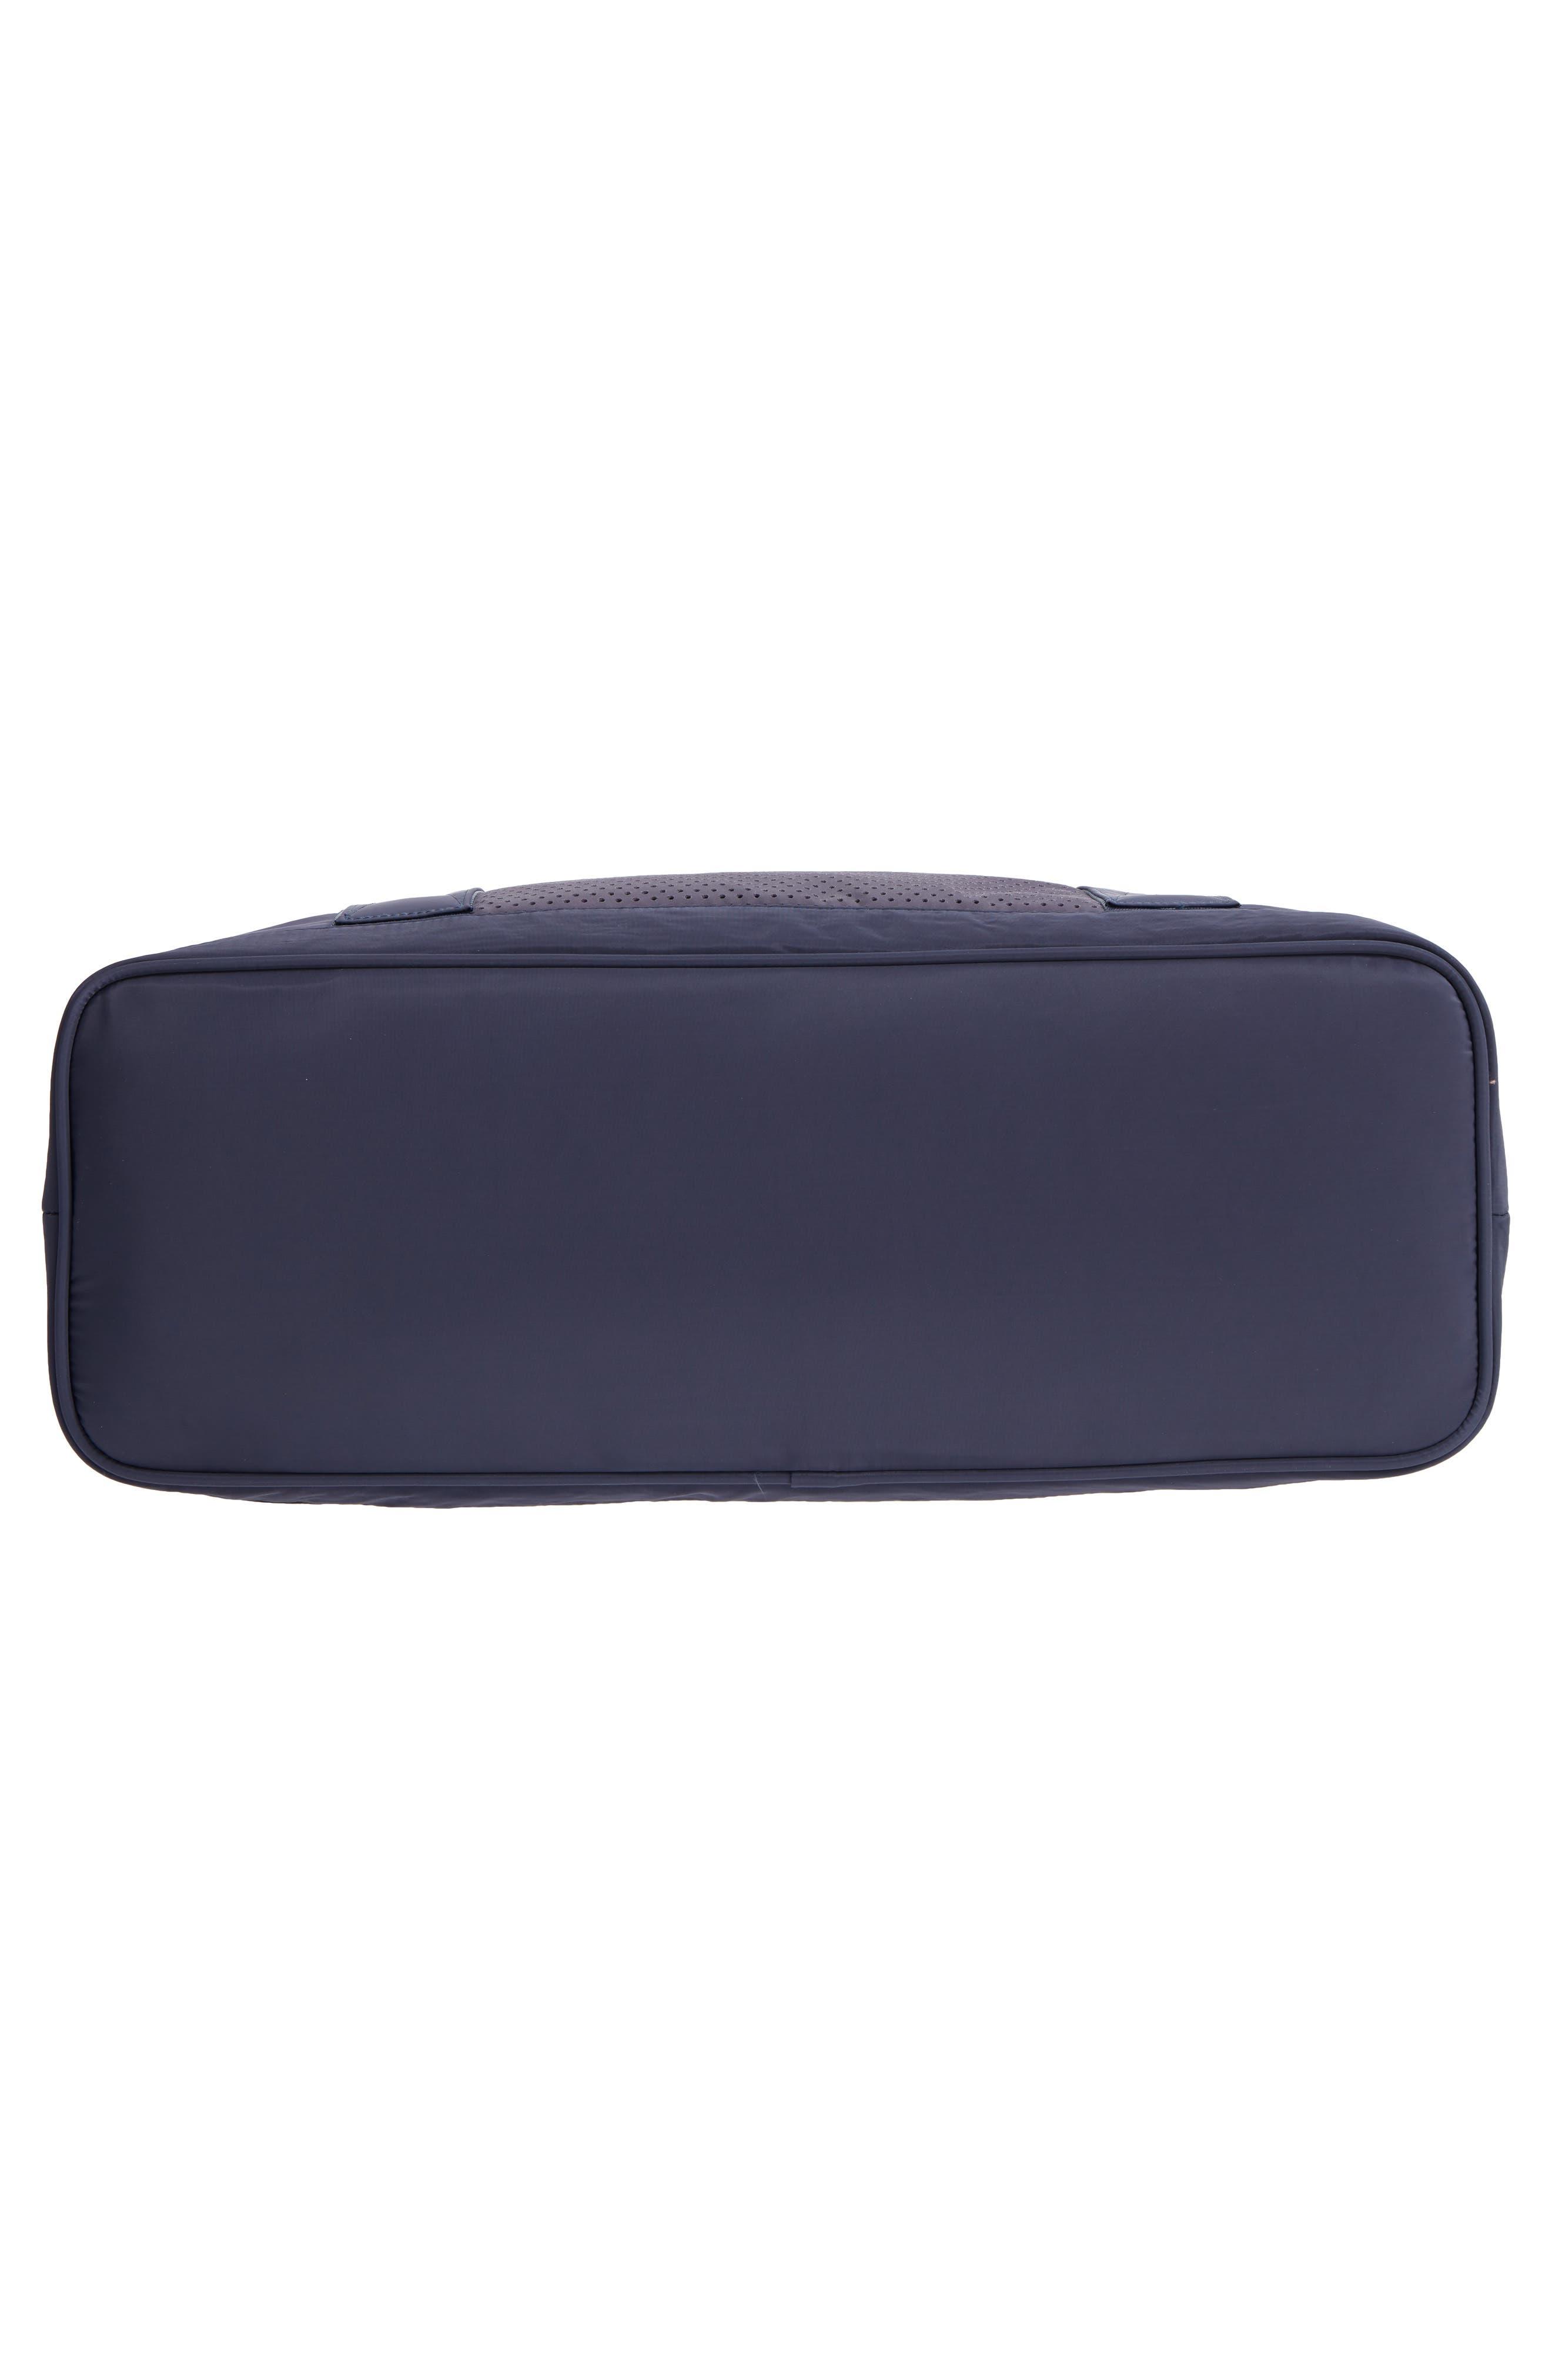 New Perforated Duffel Bag,                             Alternate thumbnail 6, color,                             NAVY MARITIME